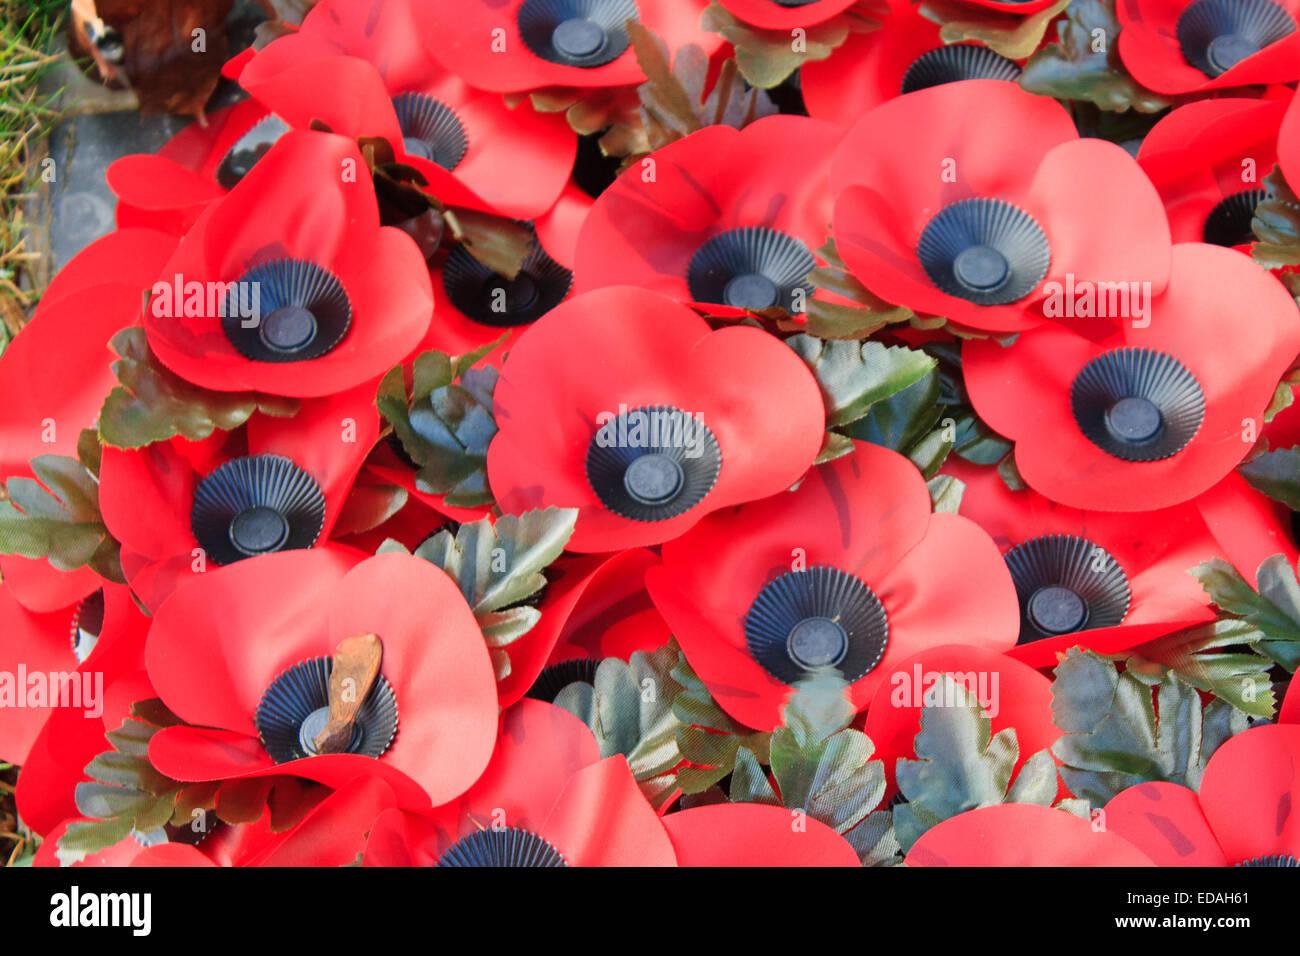 Poppy Remembrance Anzac Day World War 1 Stock Photo 77065017 Alamy